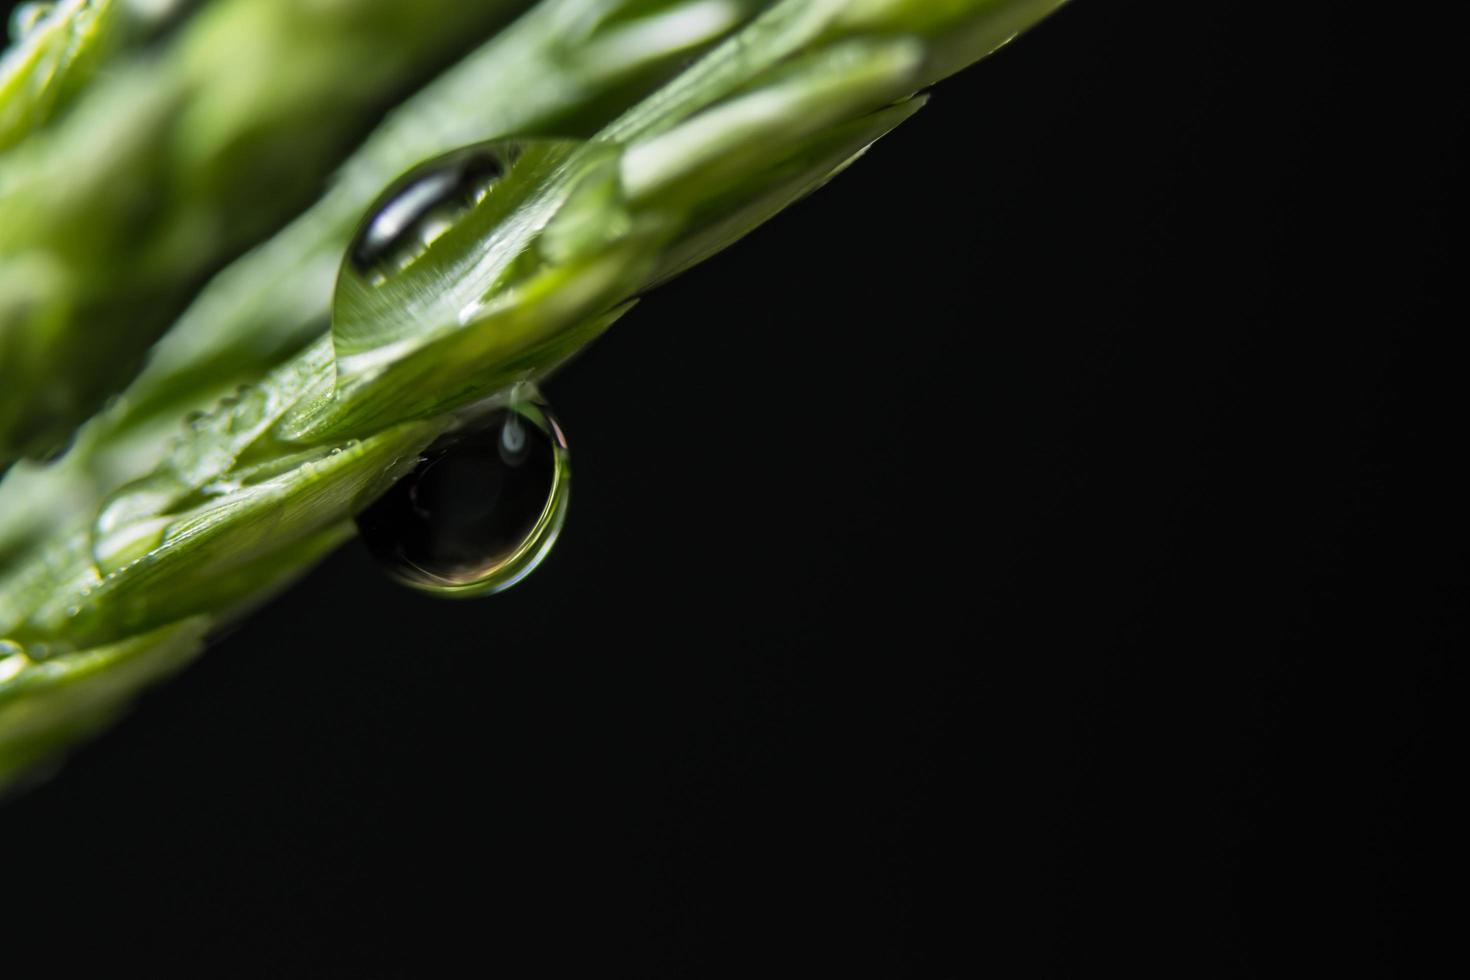 waterdruppels op een groene plant foto